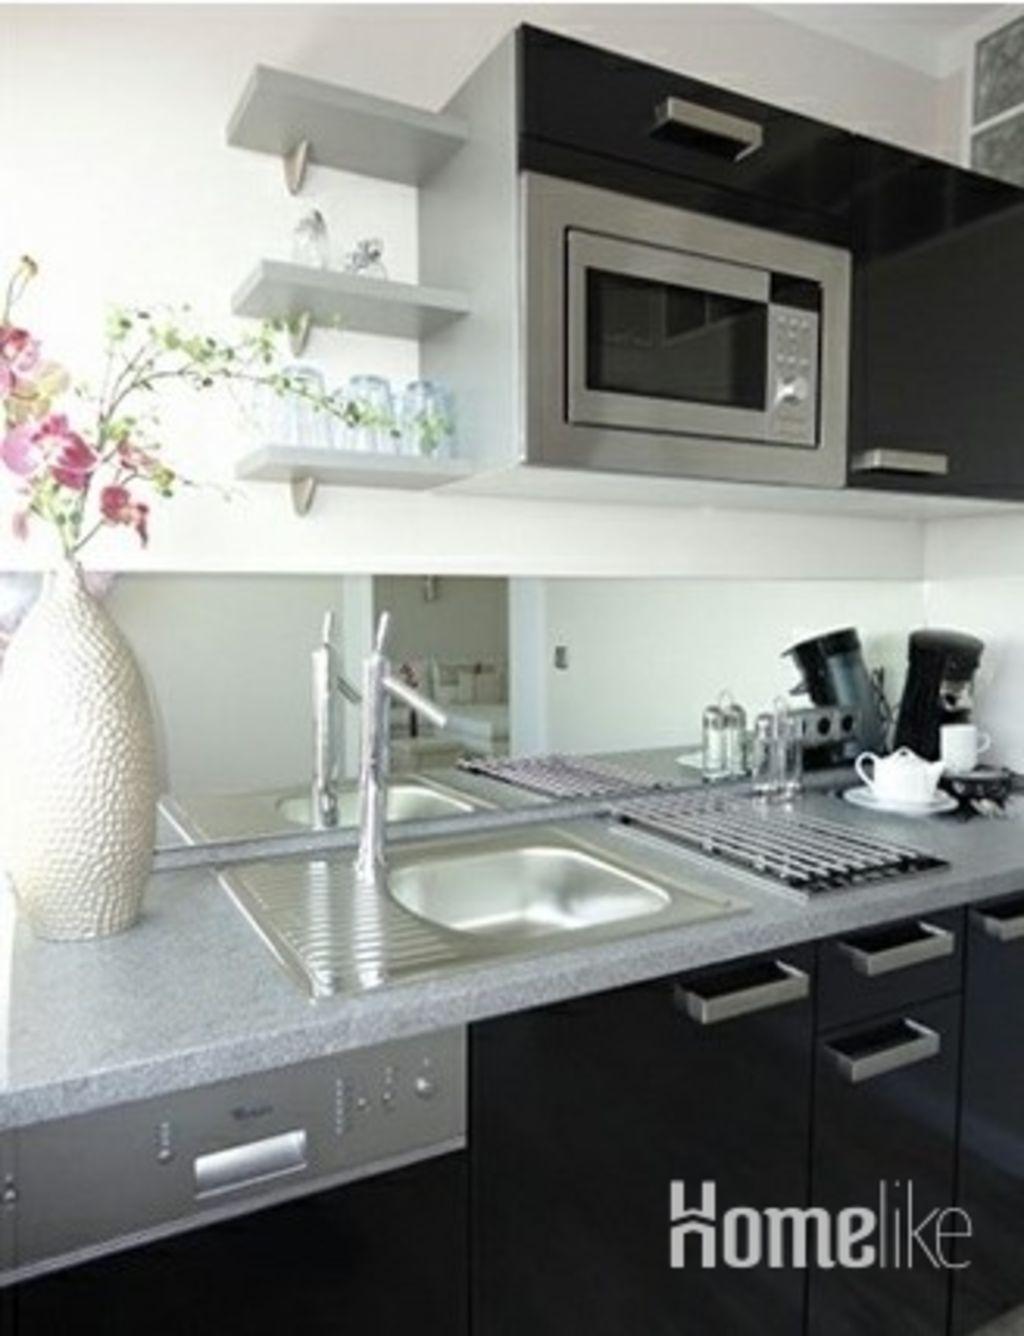 image 2 furnished 1 bedroom Apartment for rent in Kelkheim, Main-Taunus-Kreis